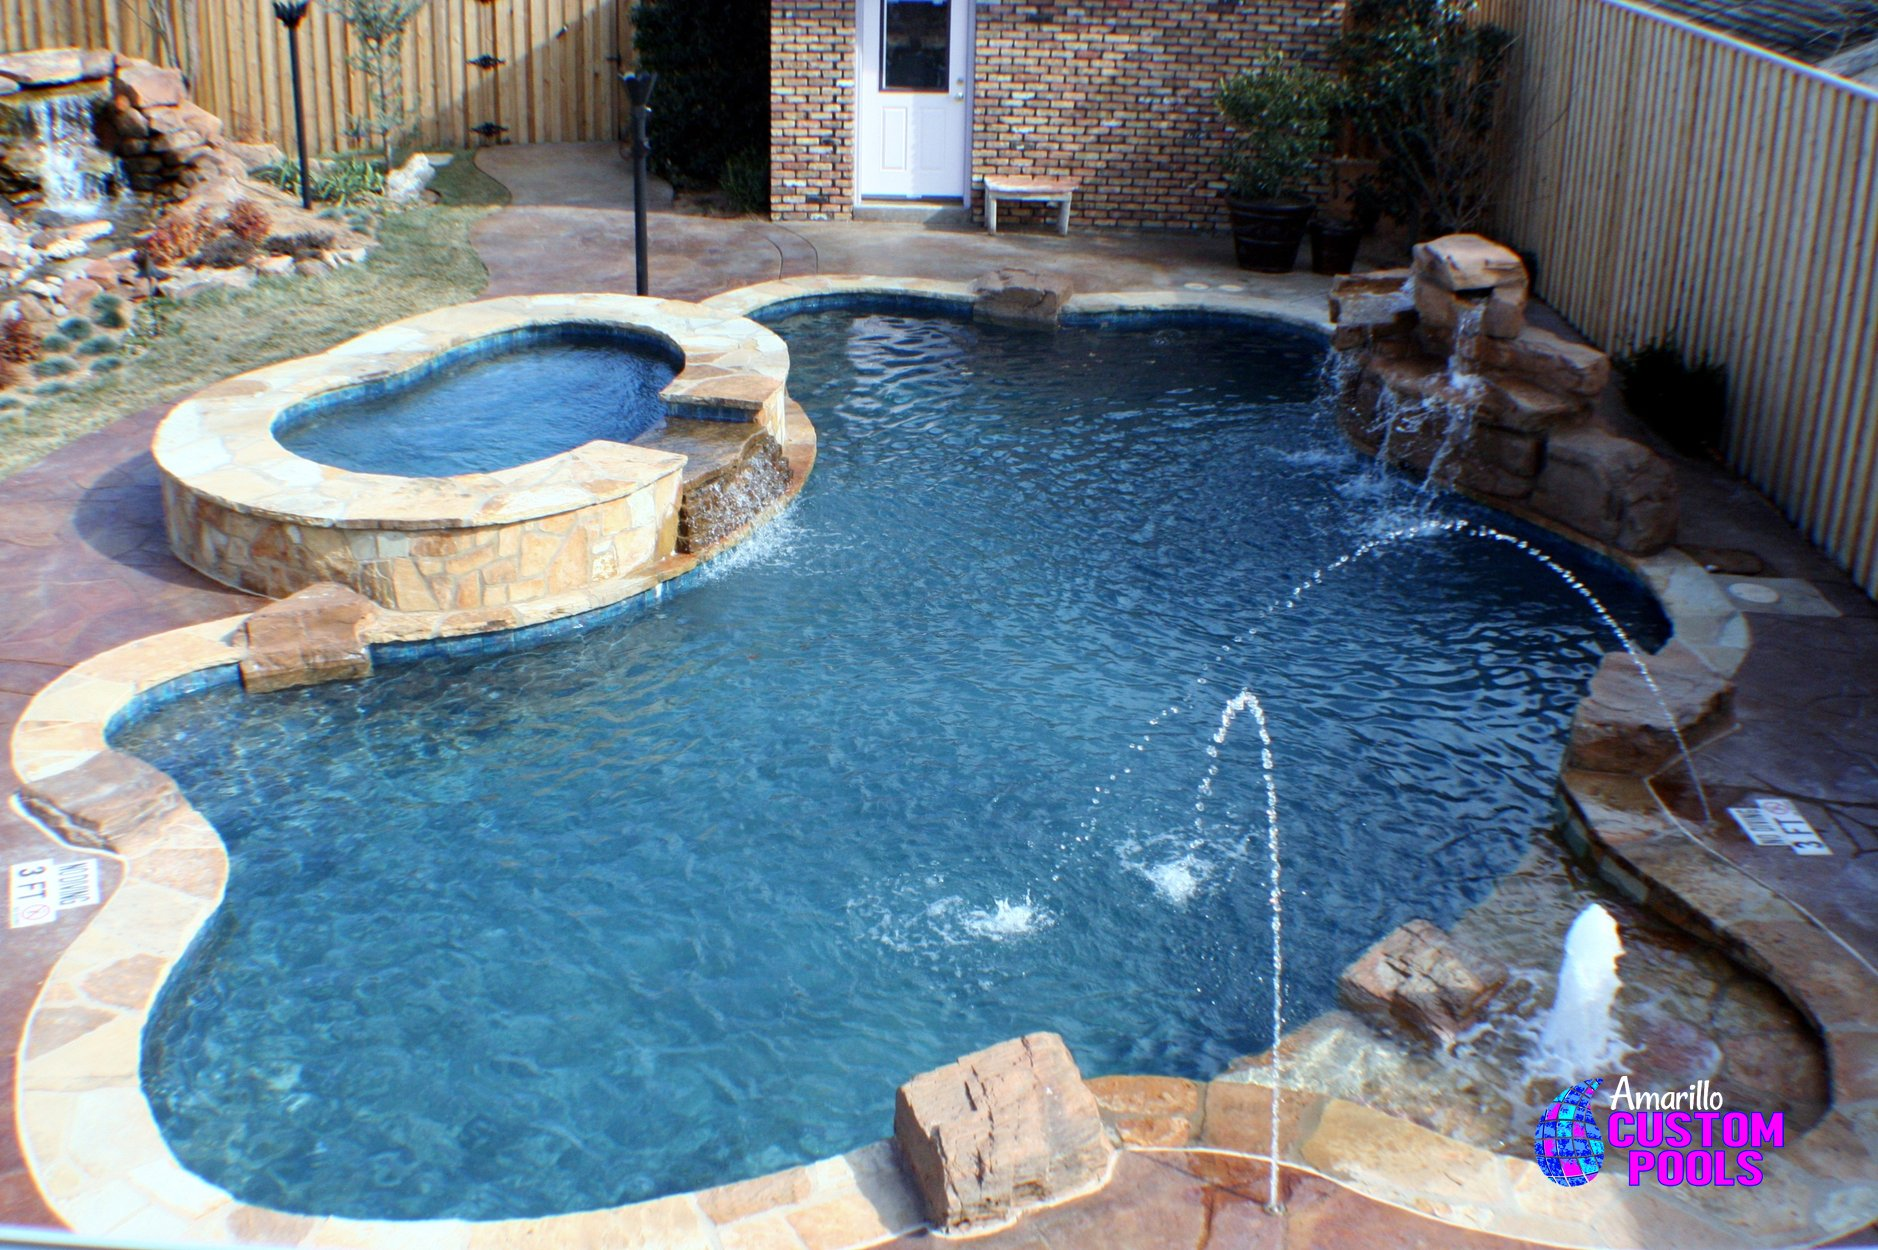 kitchen renovations on a budget remodeling buffalo ny custom gunite pool construction, amarillo, texas